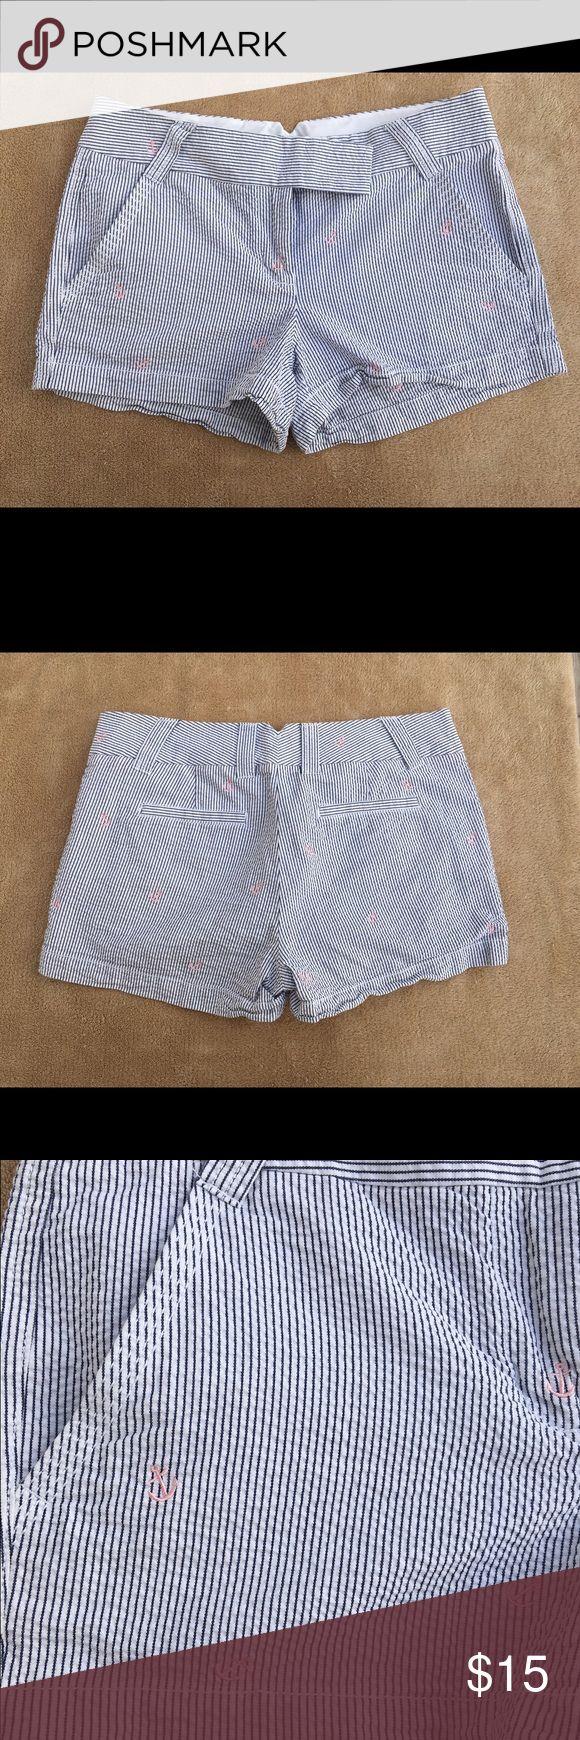 J Crew Blue Stripes With Pink Anchors Shorts J Crew Blue Stripes With Pink Anchors Shorts, size 4, preowned J. Crew Shorts